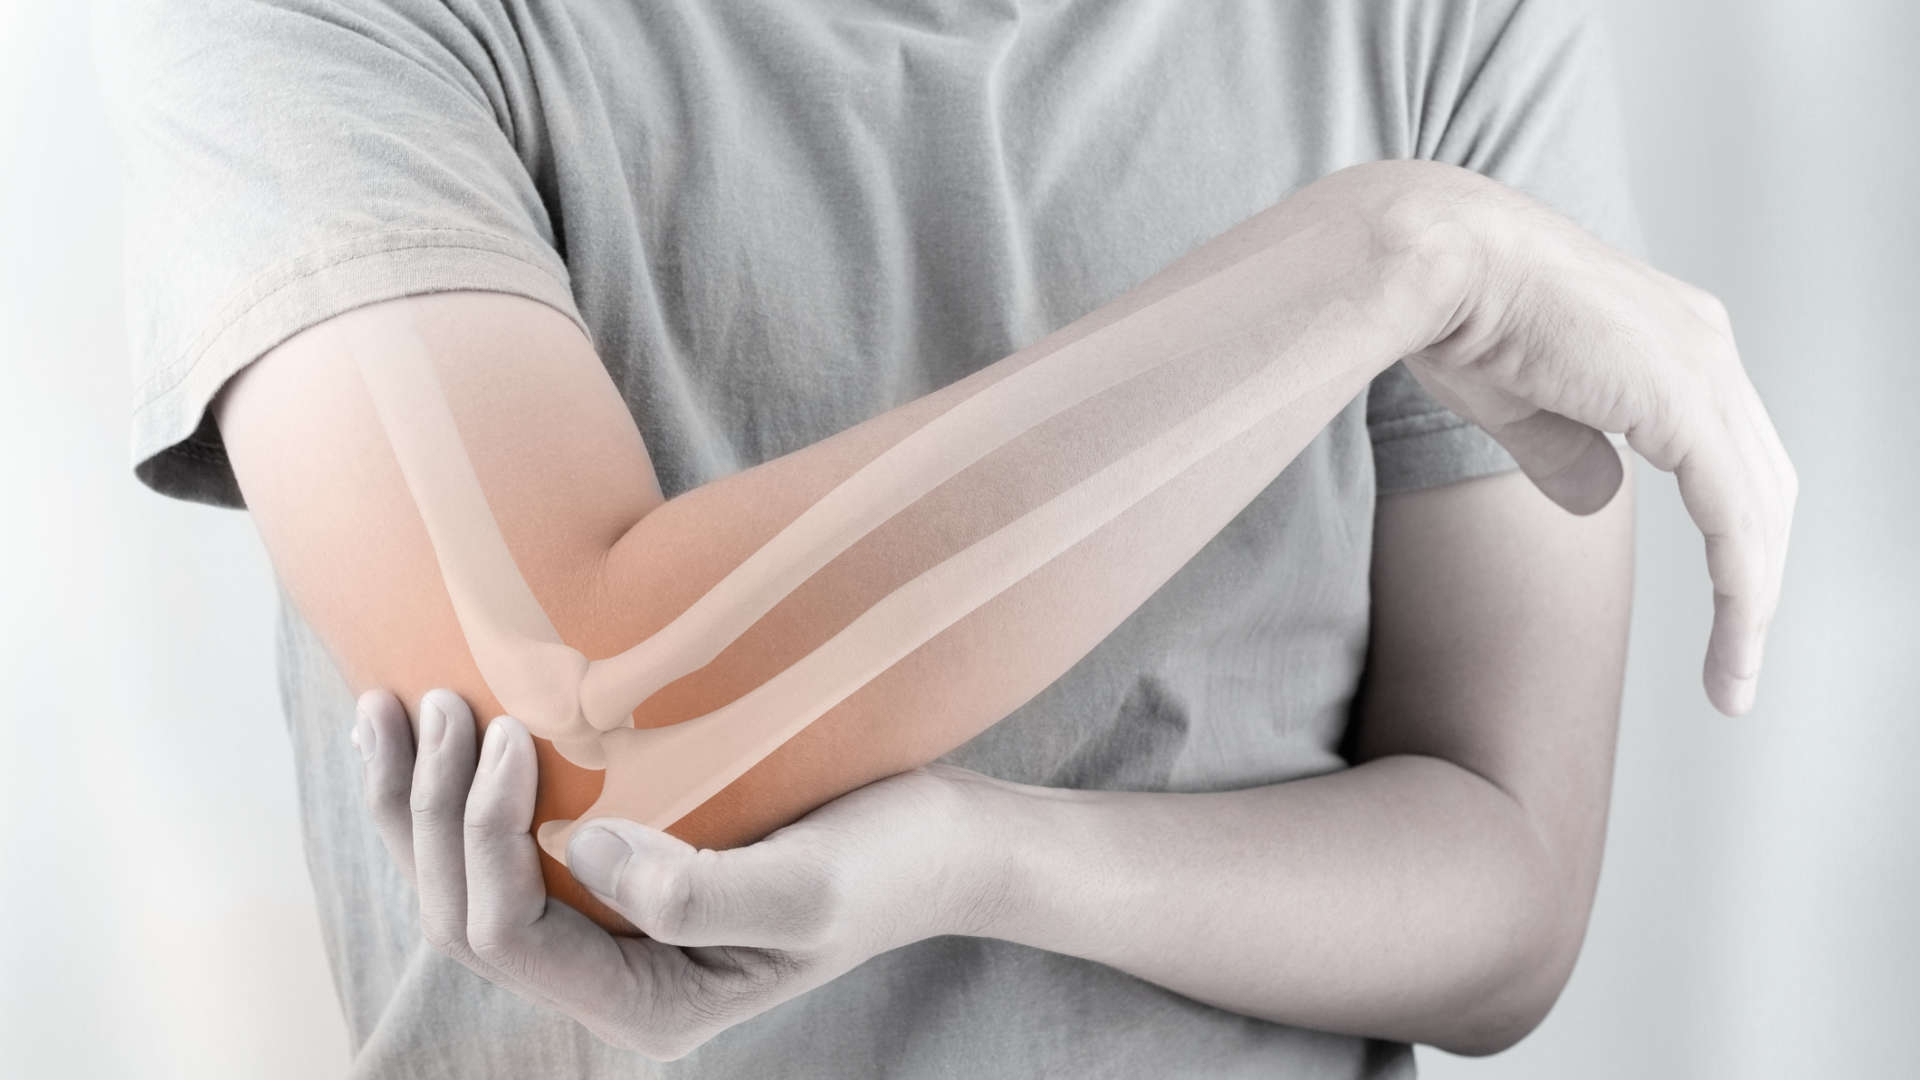 Mitos e verdades sobre osteoporose